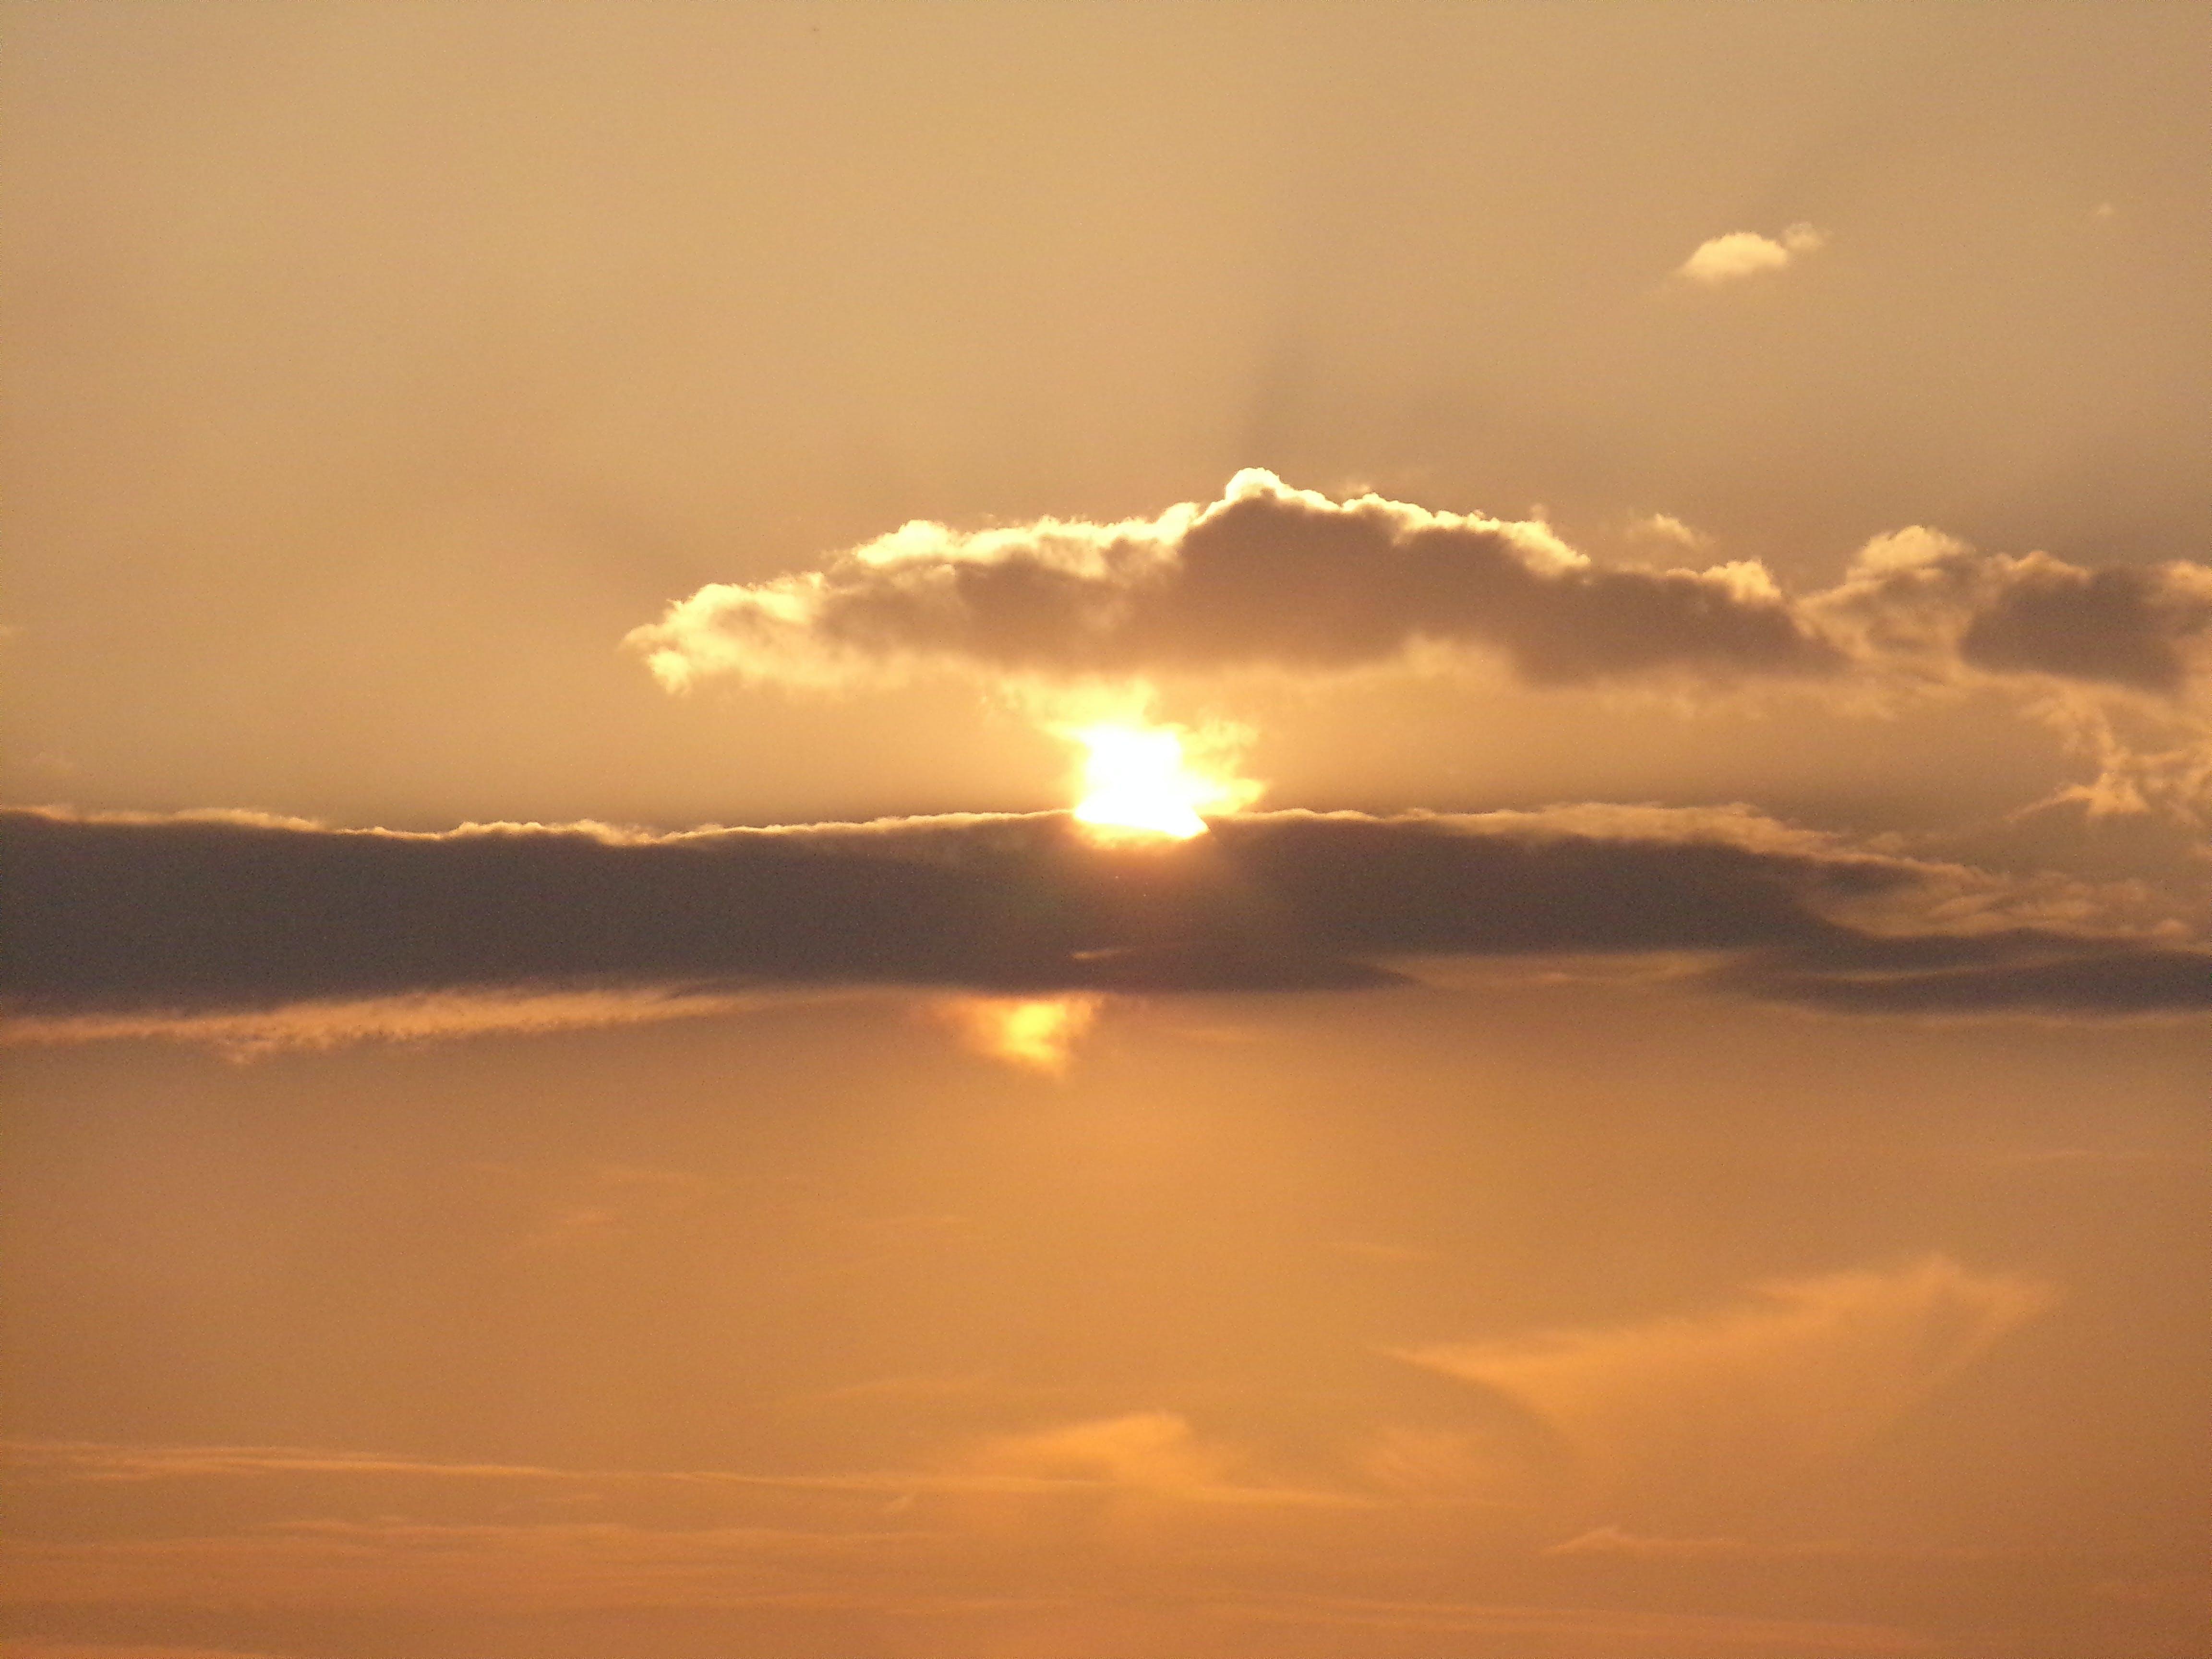 Free stock photo of Beautiful sunset, golden sunset, sky, sunset